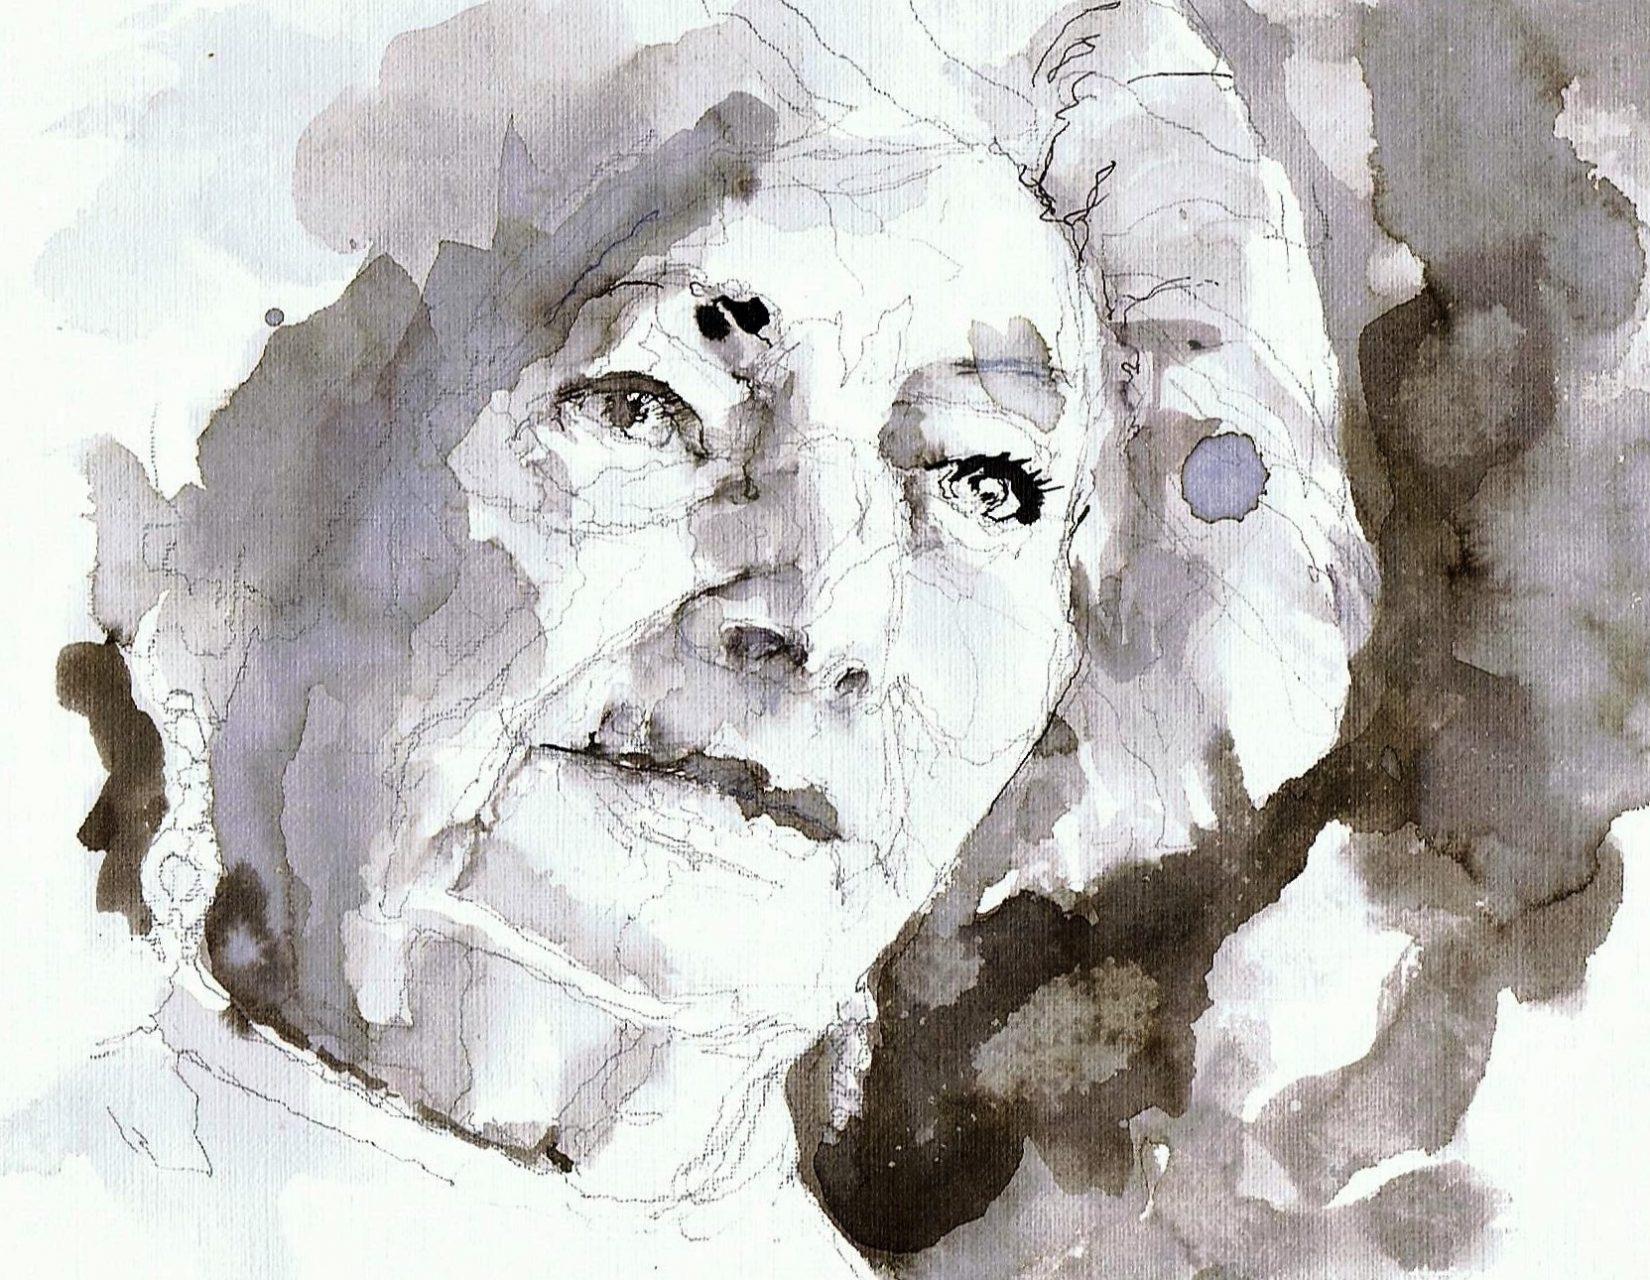 365 dagen een portret 175 Ata Kandó, fotografe Gewassen inkt 19c25